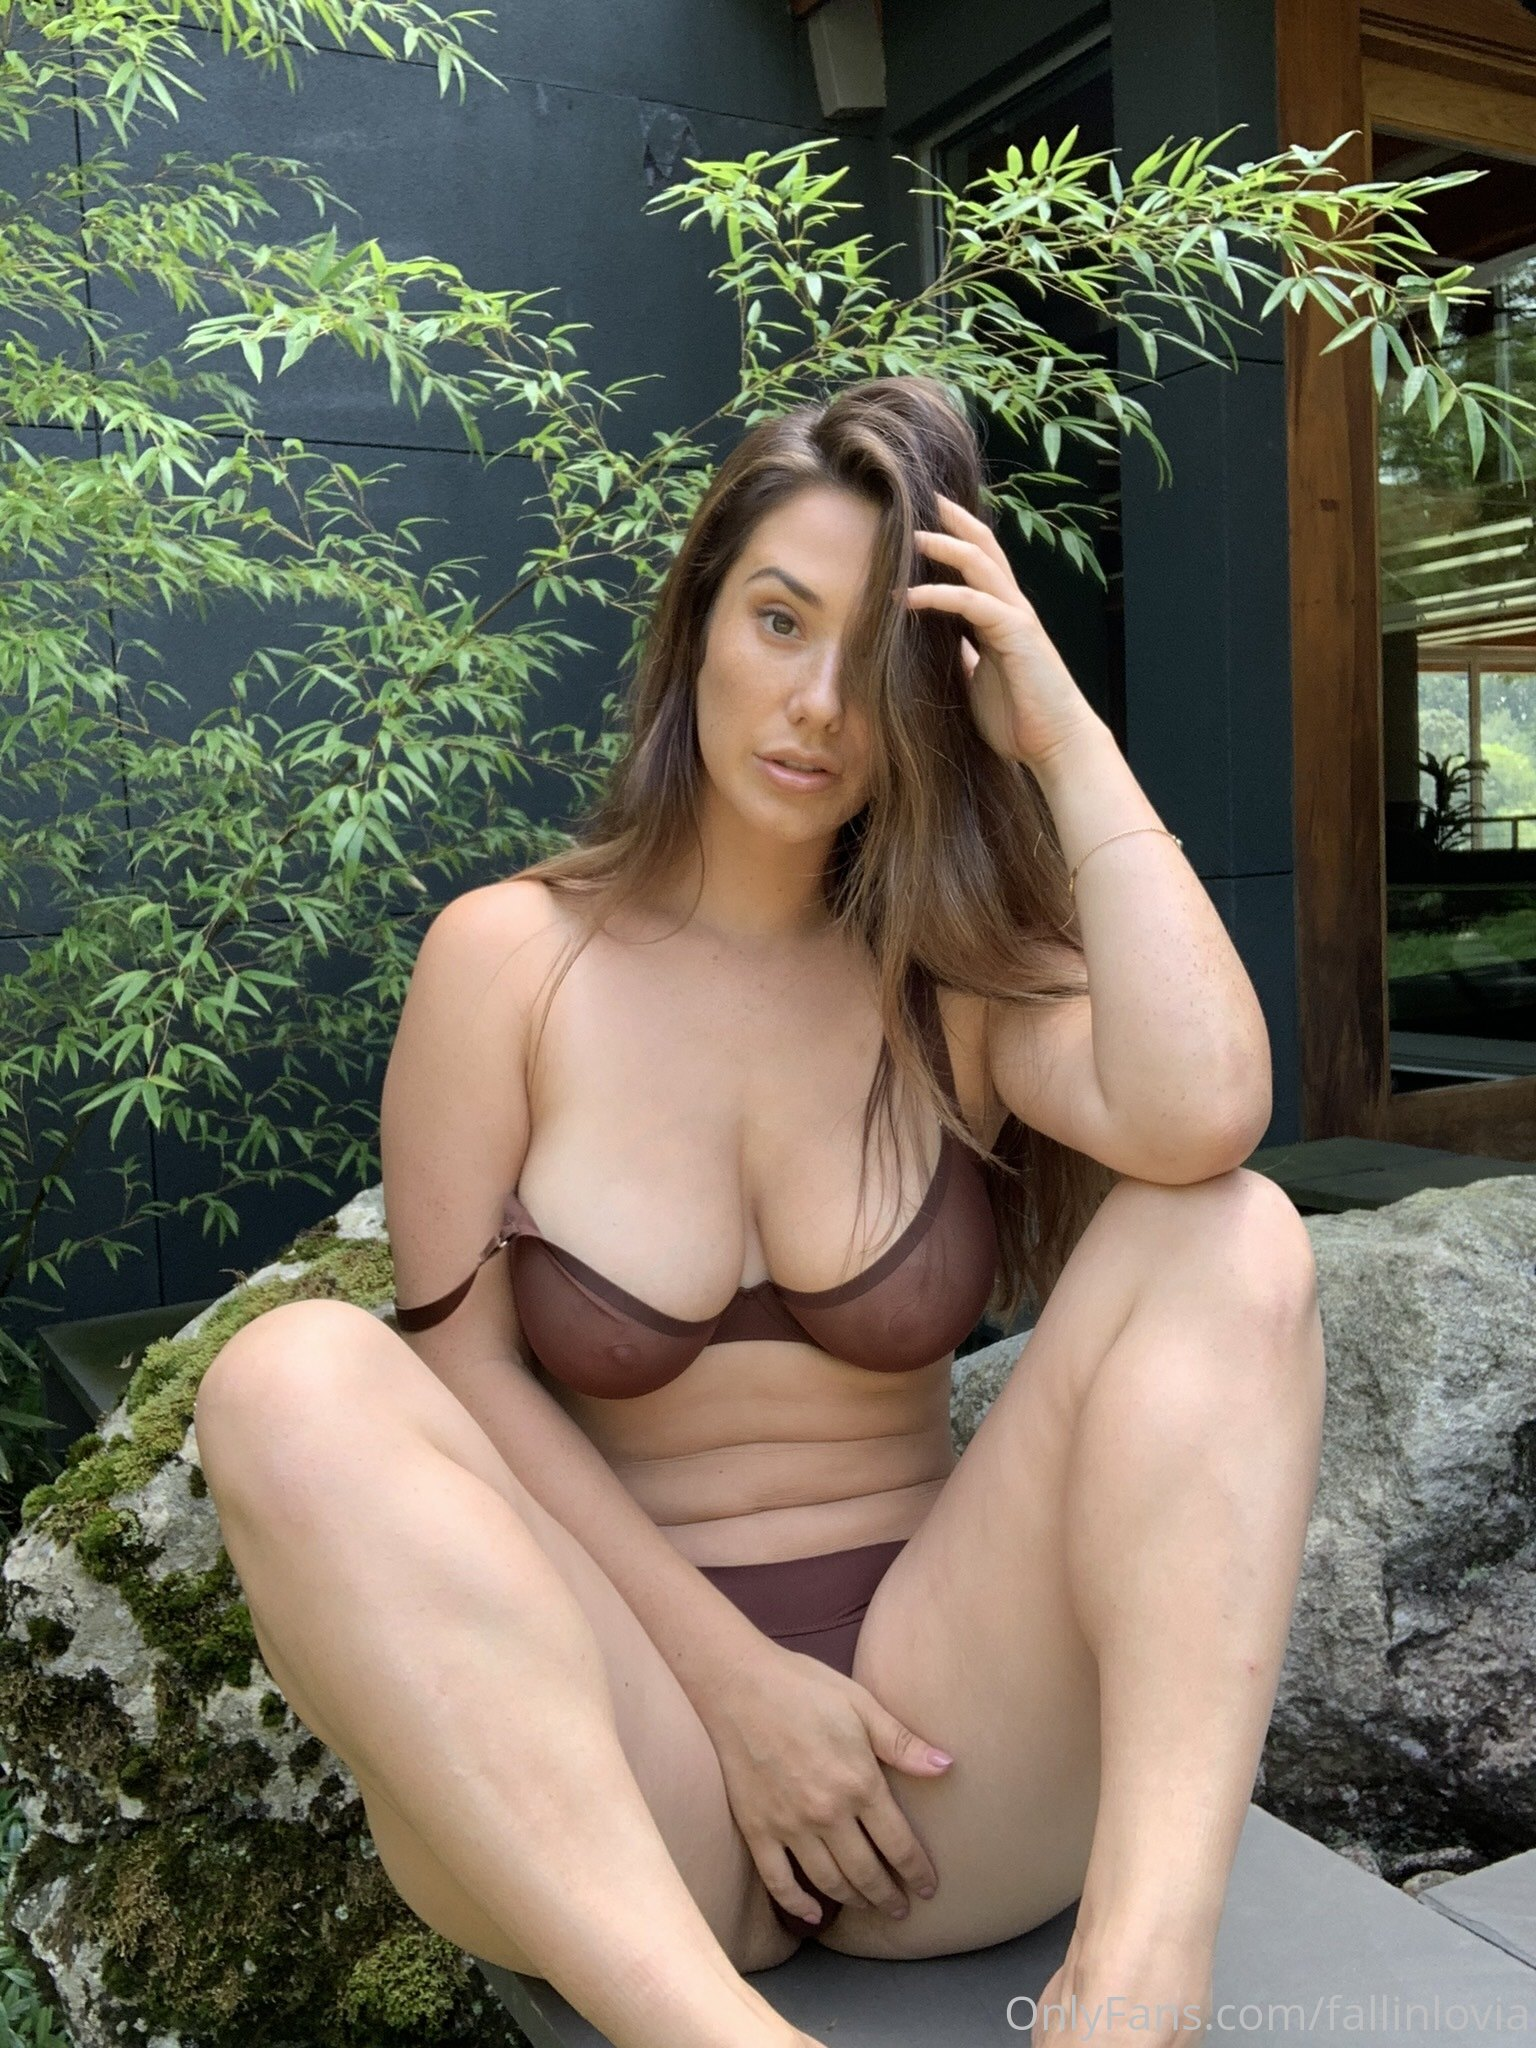 Eva Lovia, Fallinlovia, Onlyfans 0254